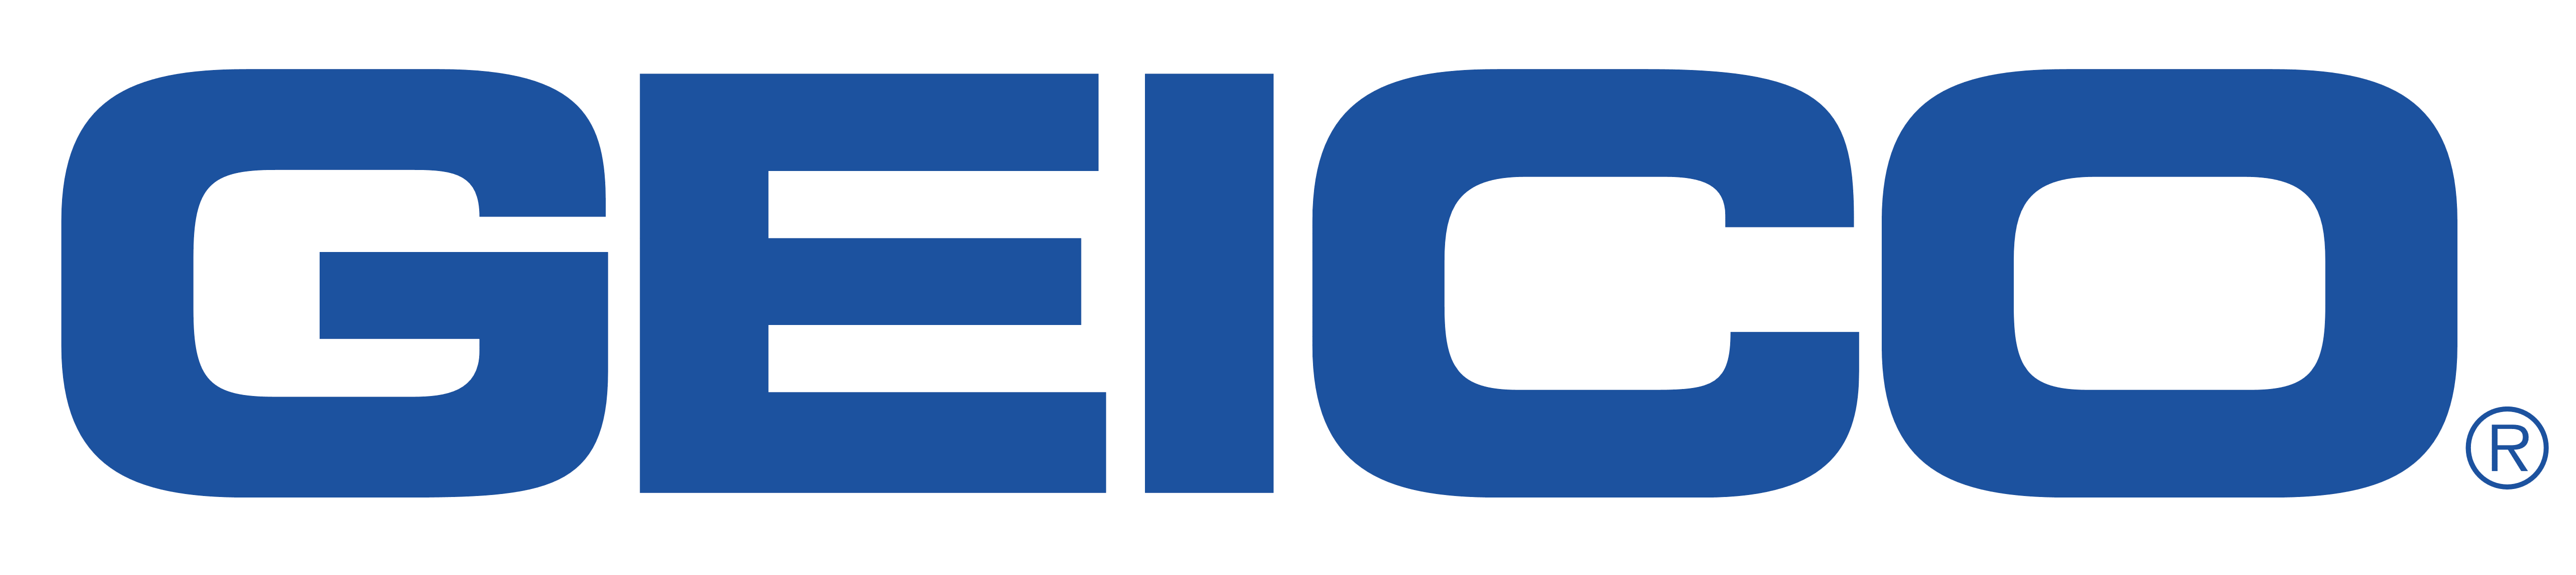 GEICO Medical Provider Portal Logo